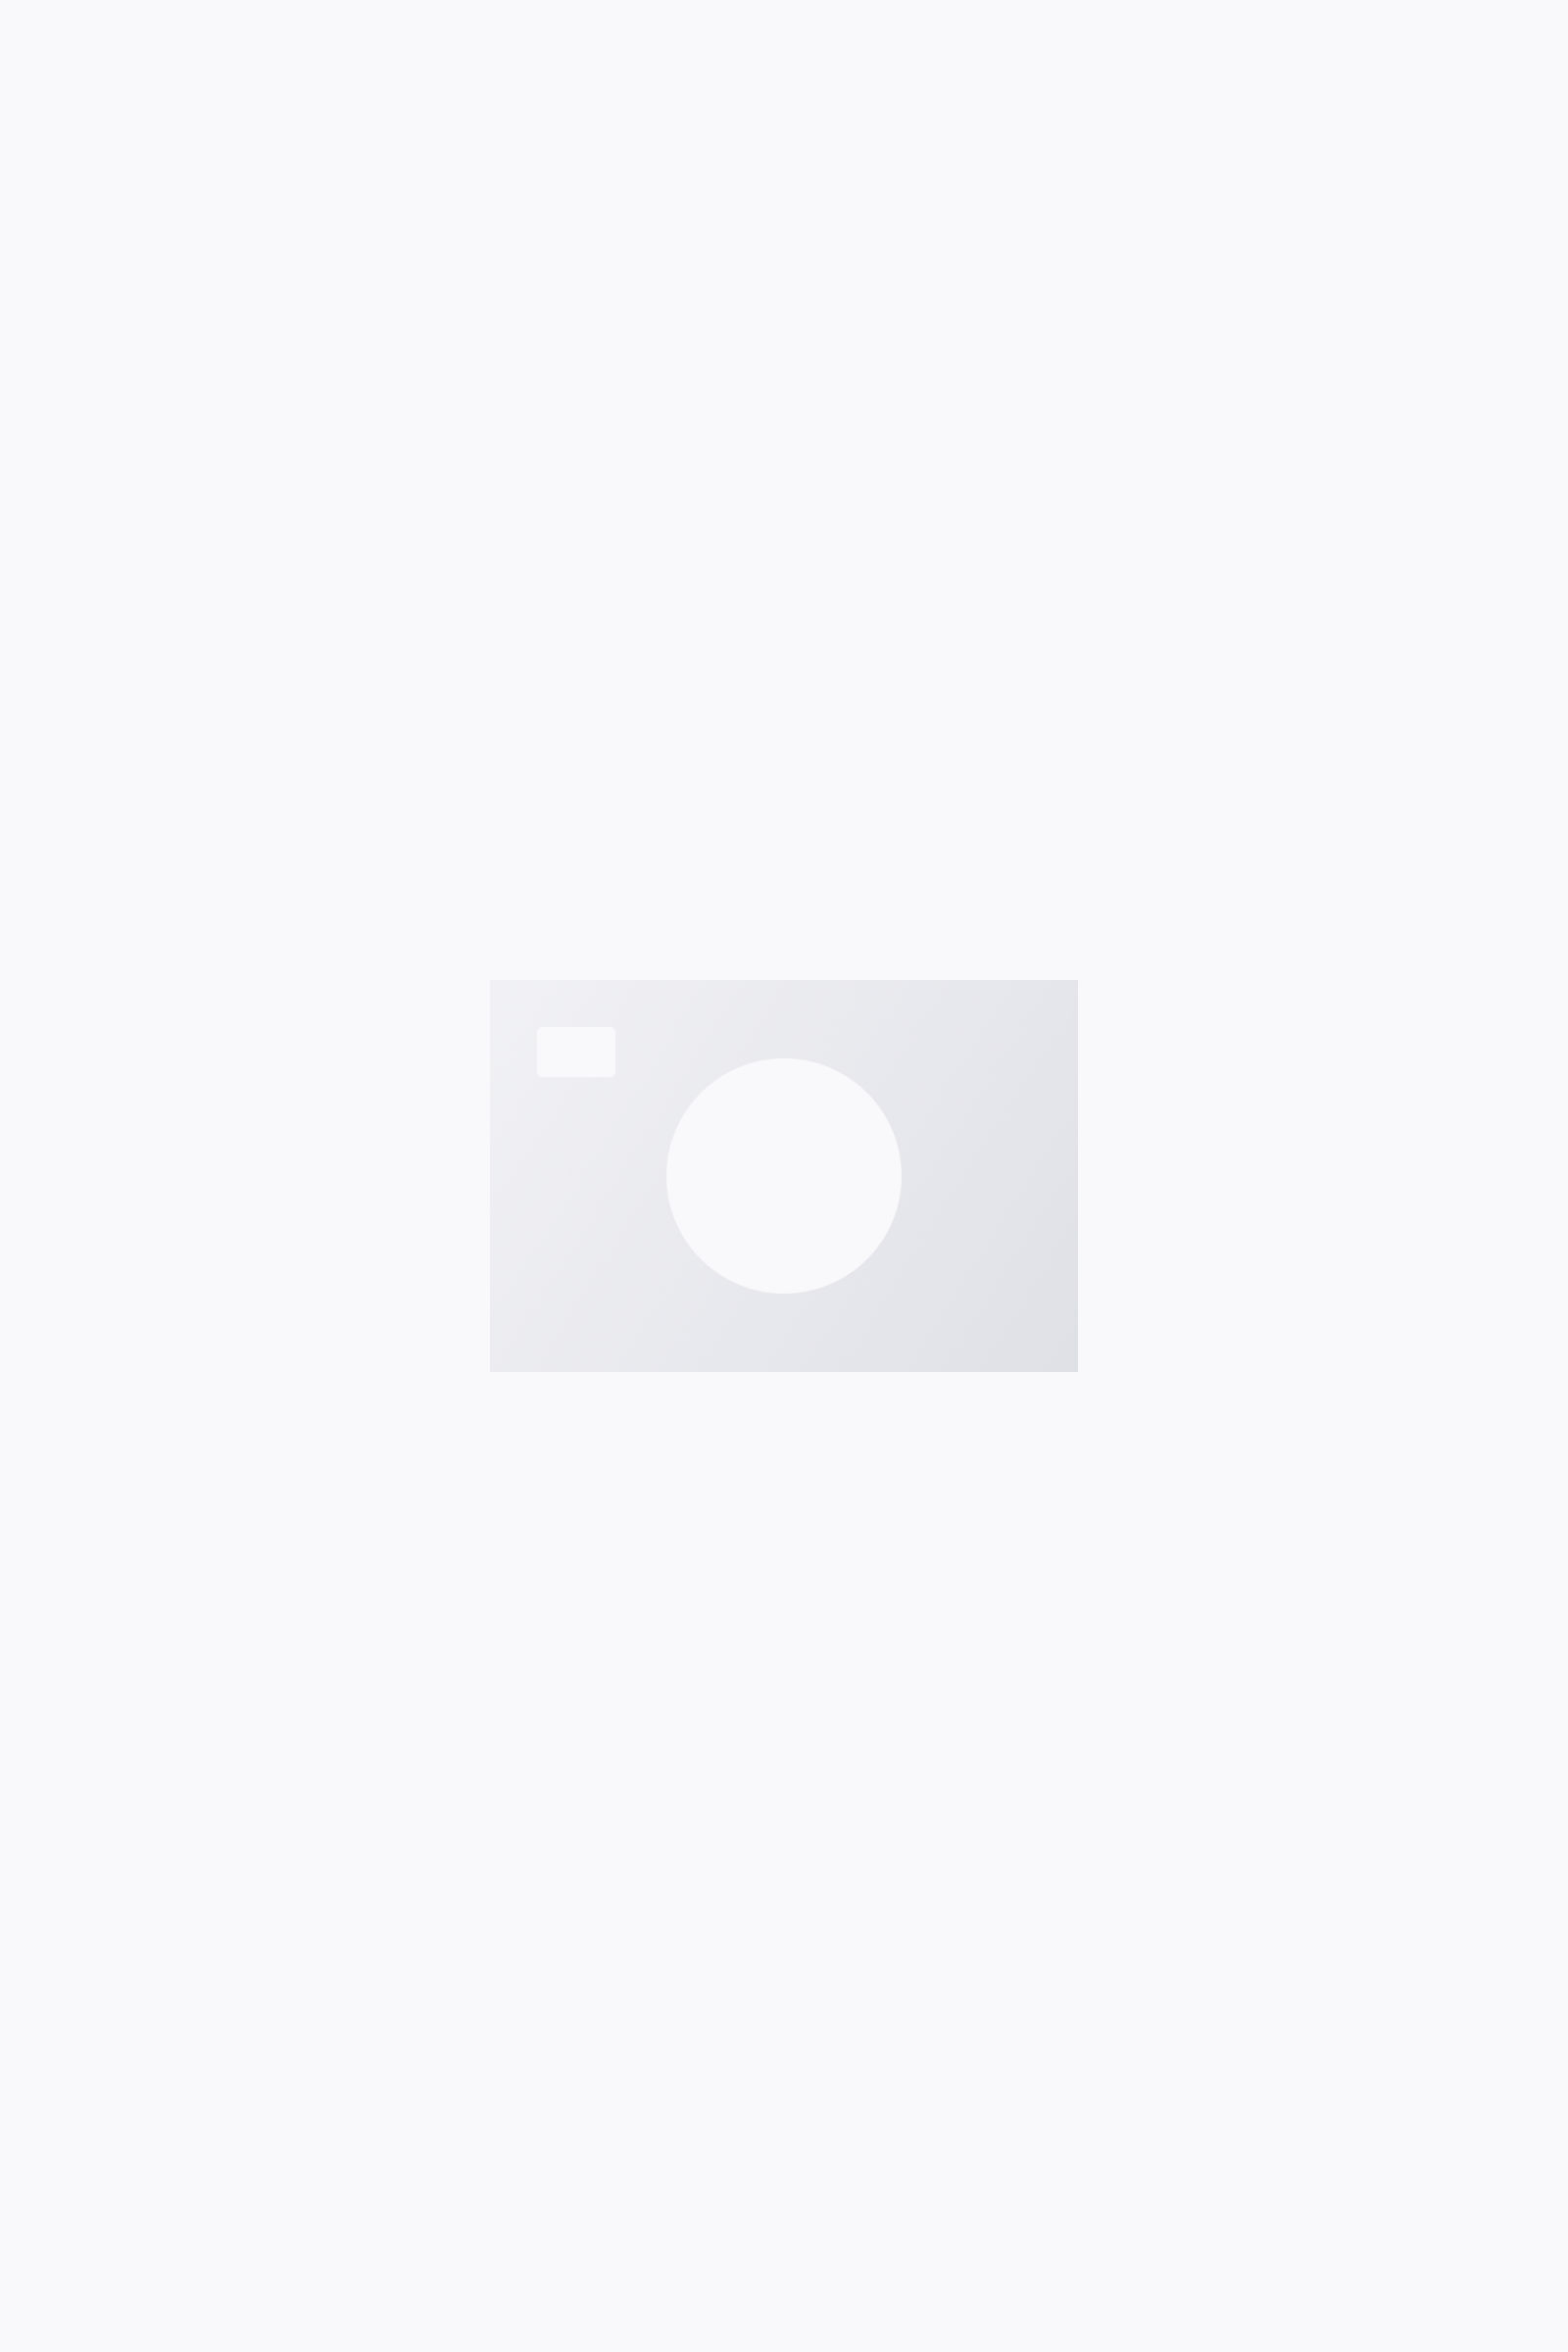 COS REGULAR-FIT T-SHIRT,dusty light blue